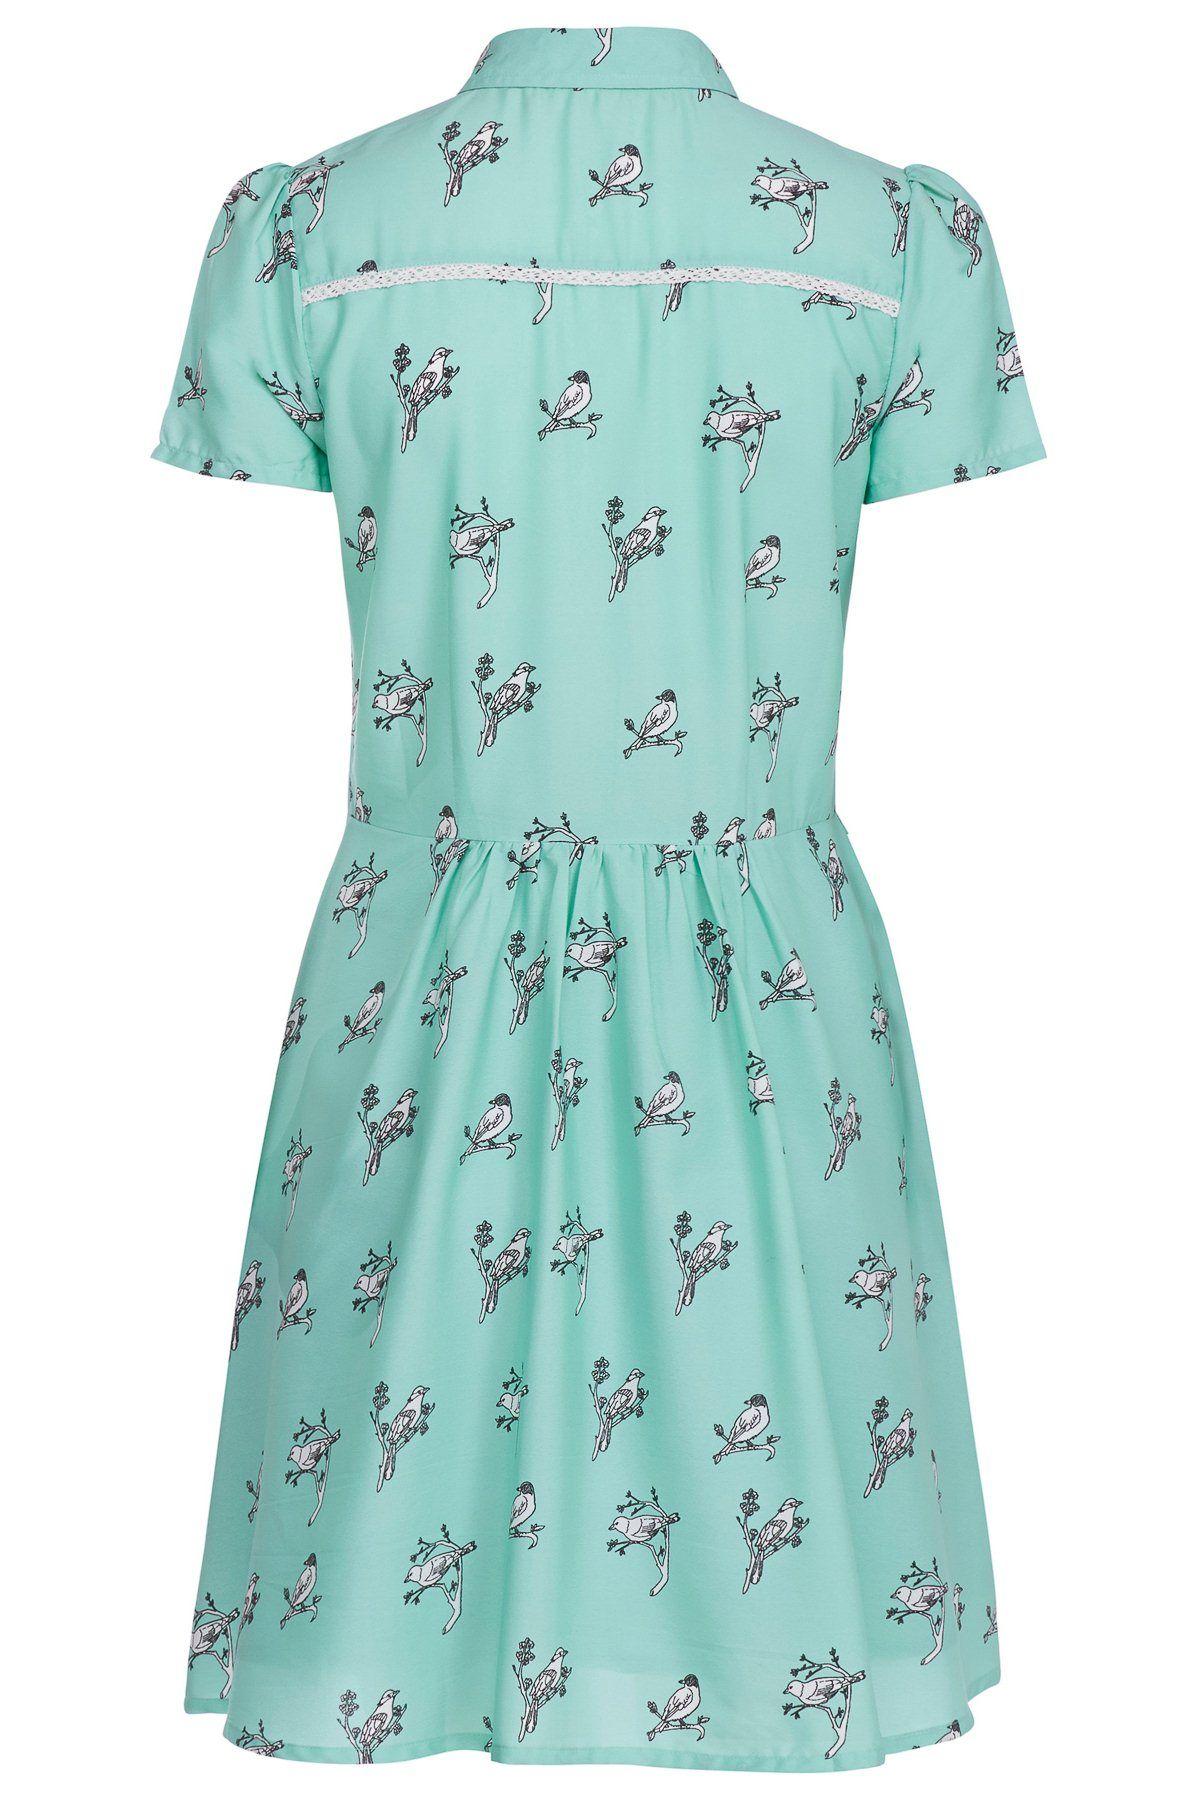 Birdie Dress - Green Image